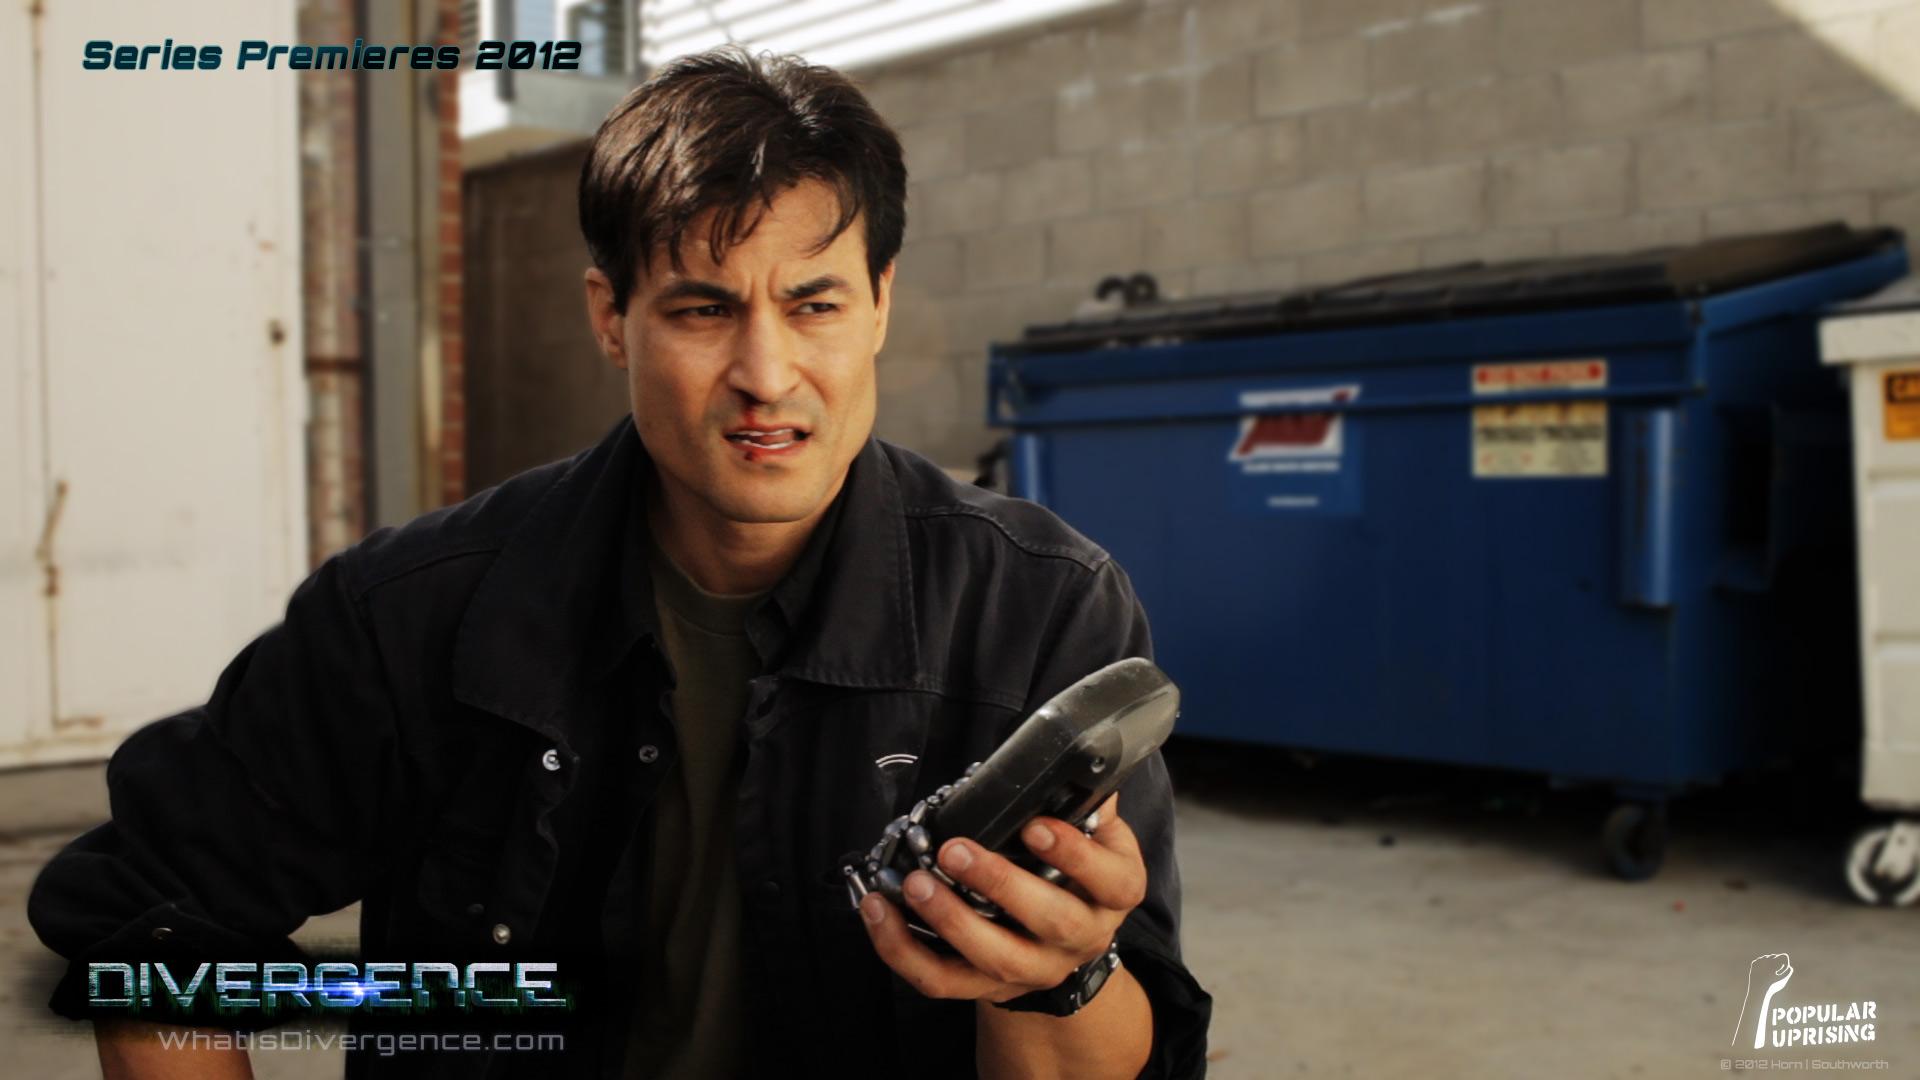 مؤدي صوت فيرجل ( Dan Southworth ) يعمل على سلسلة Divergence DIVERGENCE_Still_DanSouthworth03